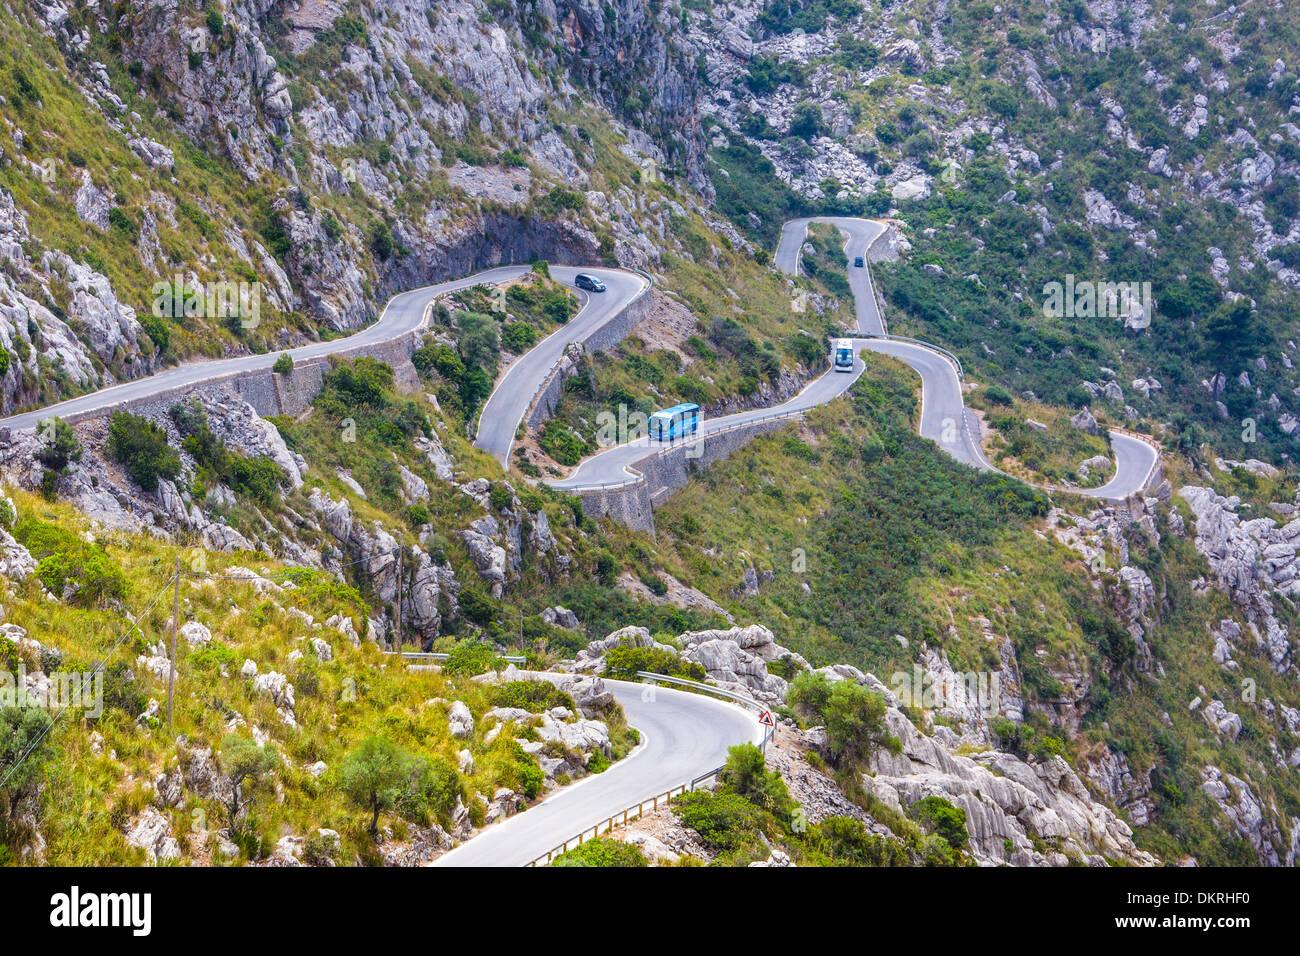 Drive Mallorca Balearics Sa Calobra bus curve island landscape mountain nature pass road rocks sightseeing Spain Europe steep - Stock Image